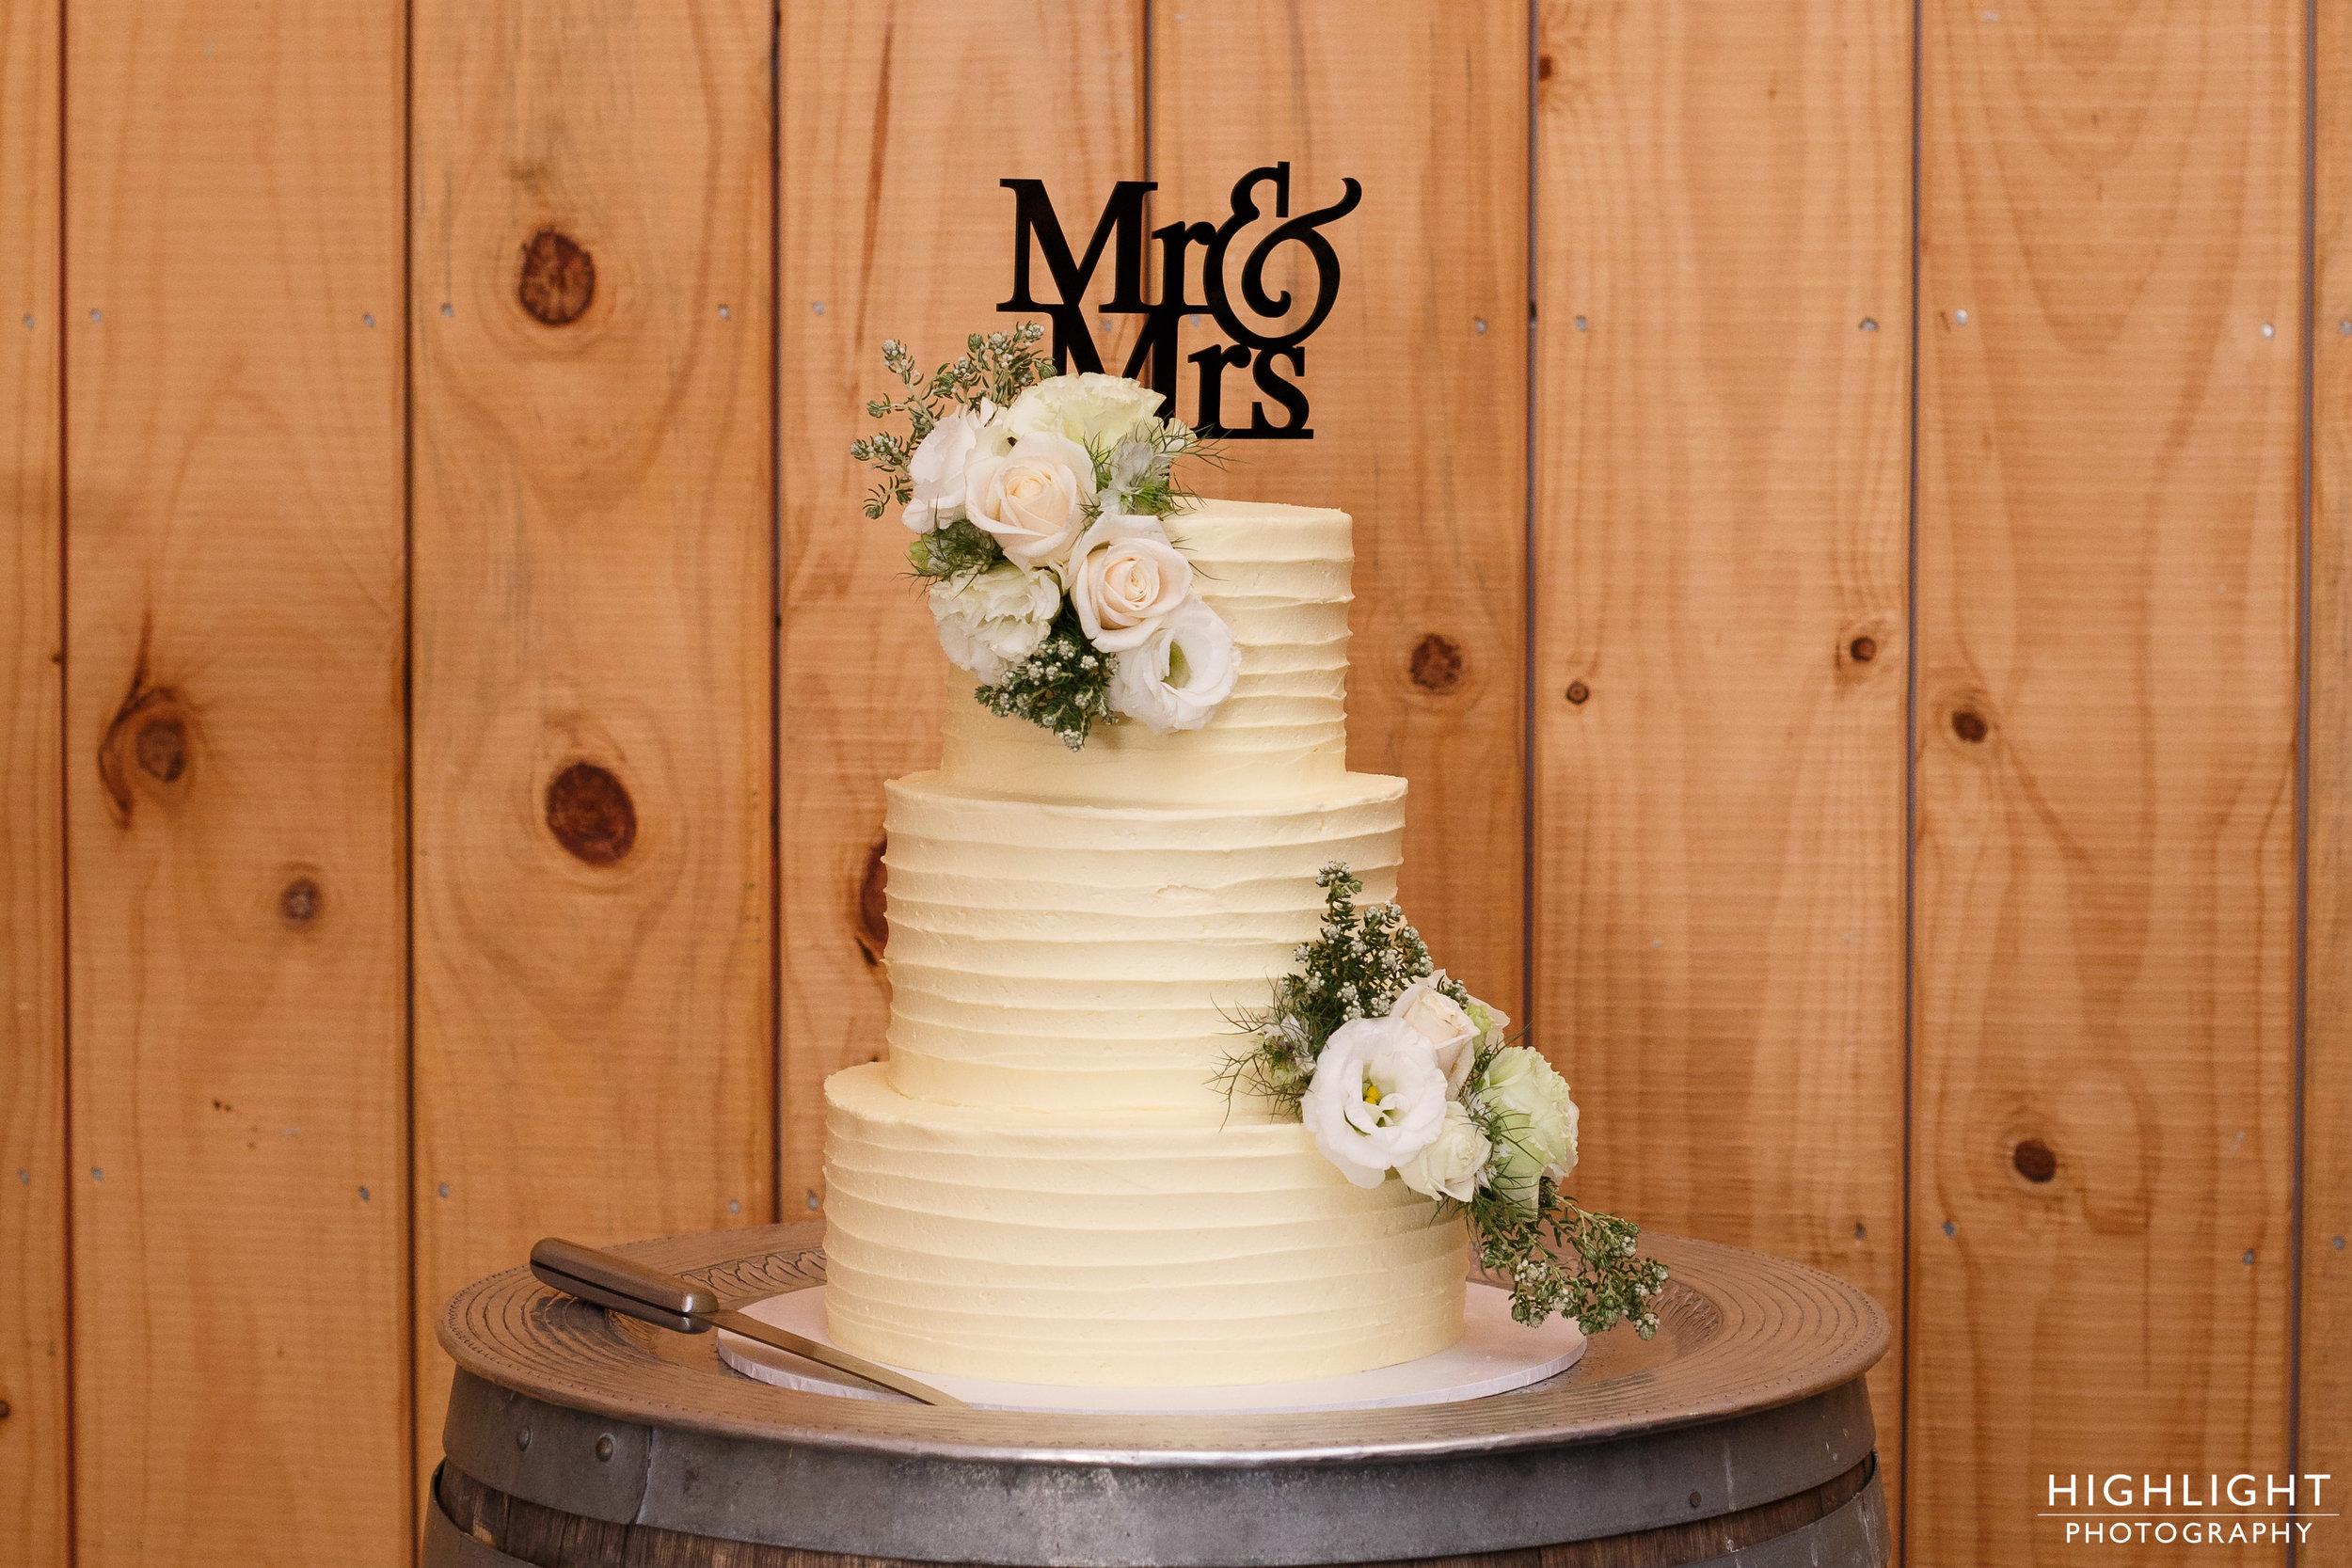 highlight-wedding-photography-palmerston-north-new-zealand-orlando-country-club-wedding-135.jpg